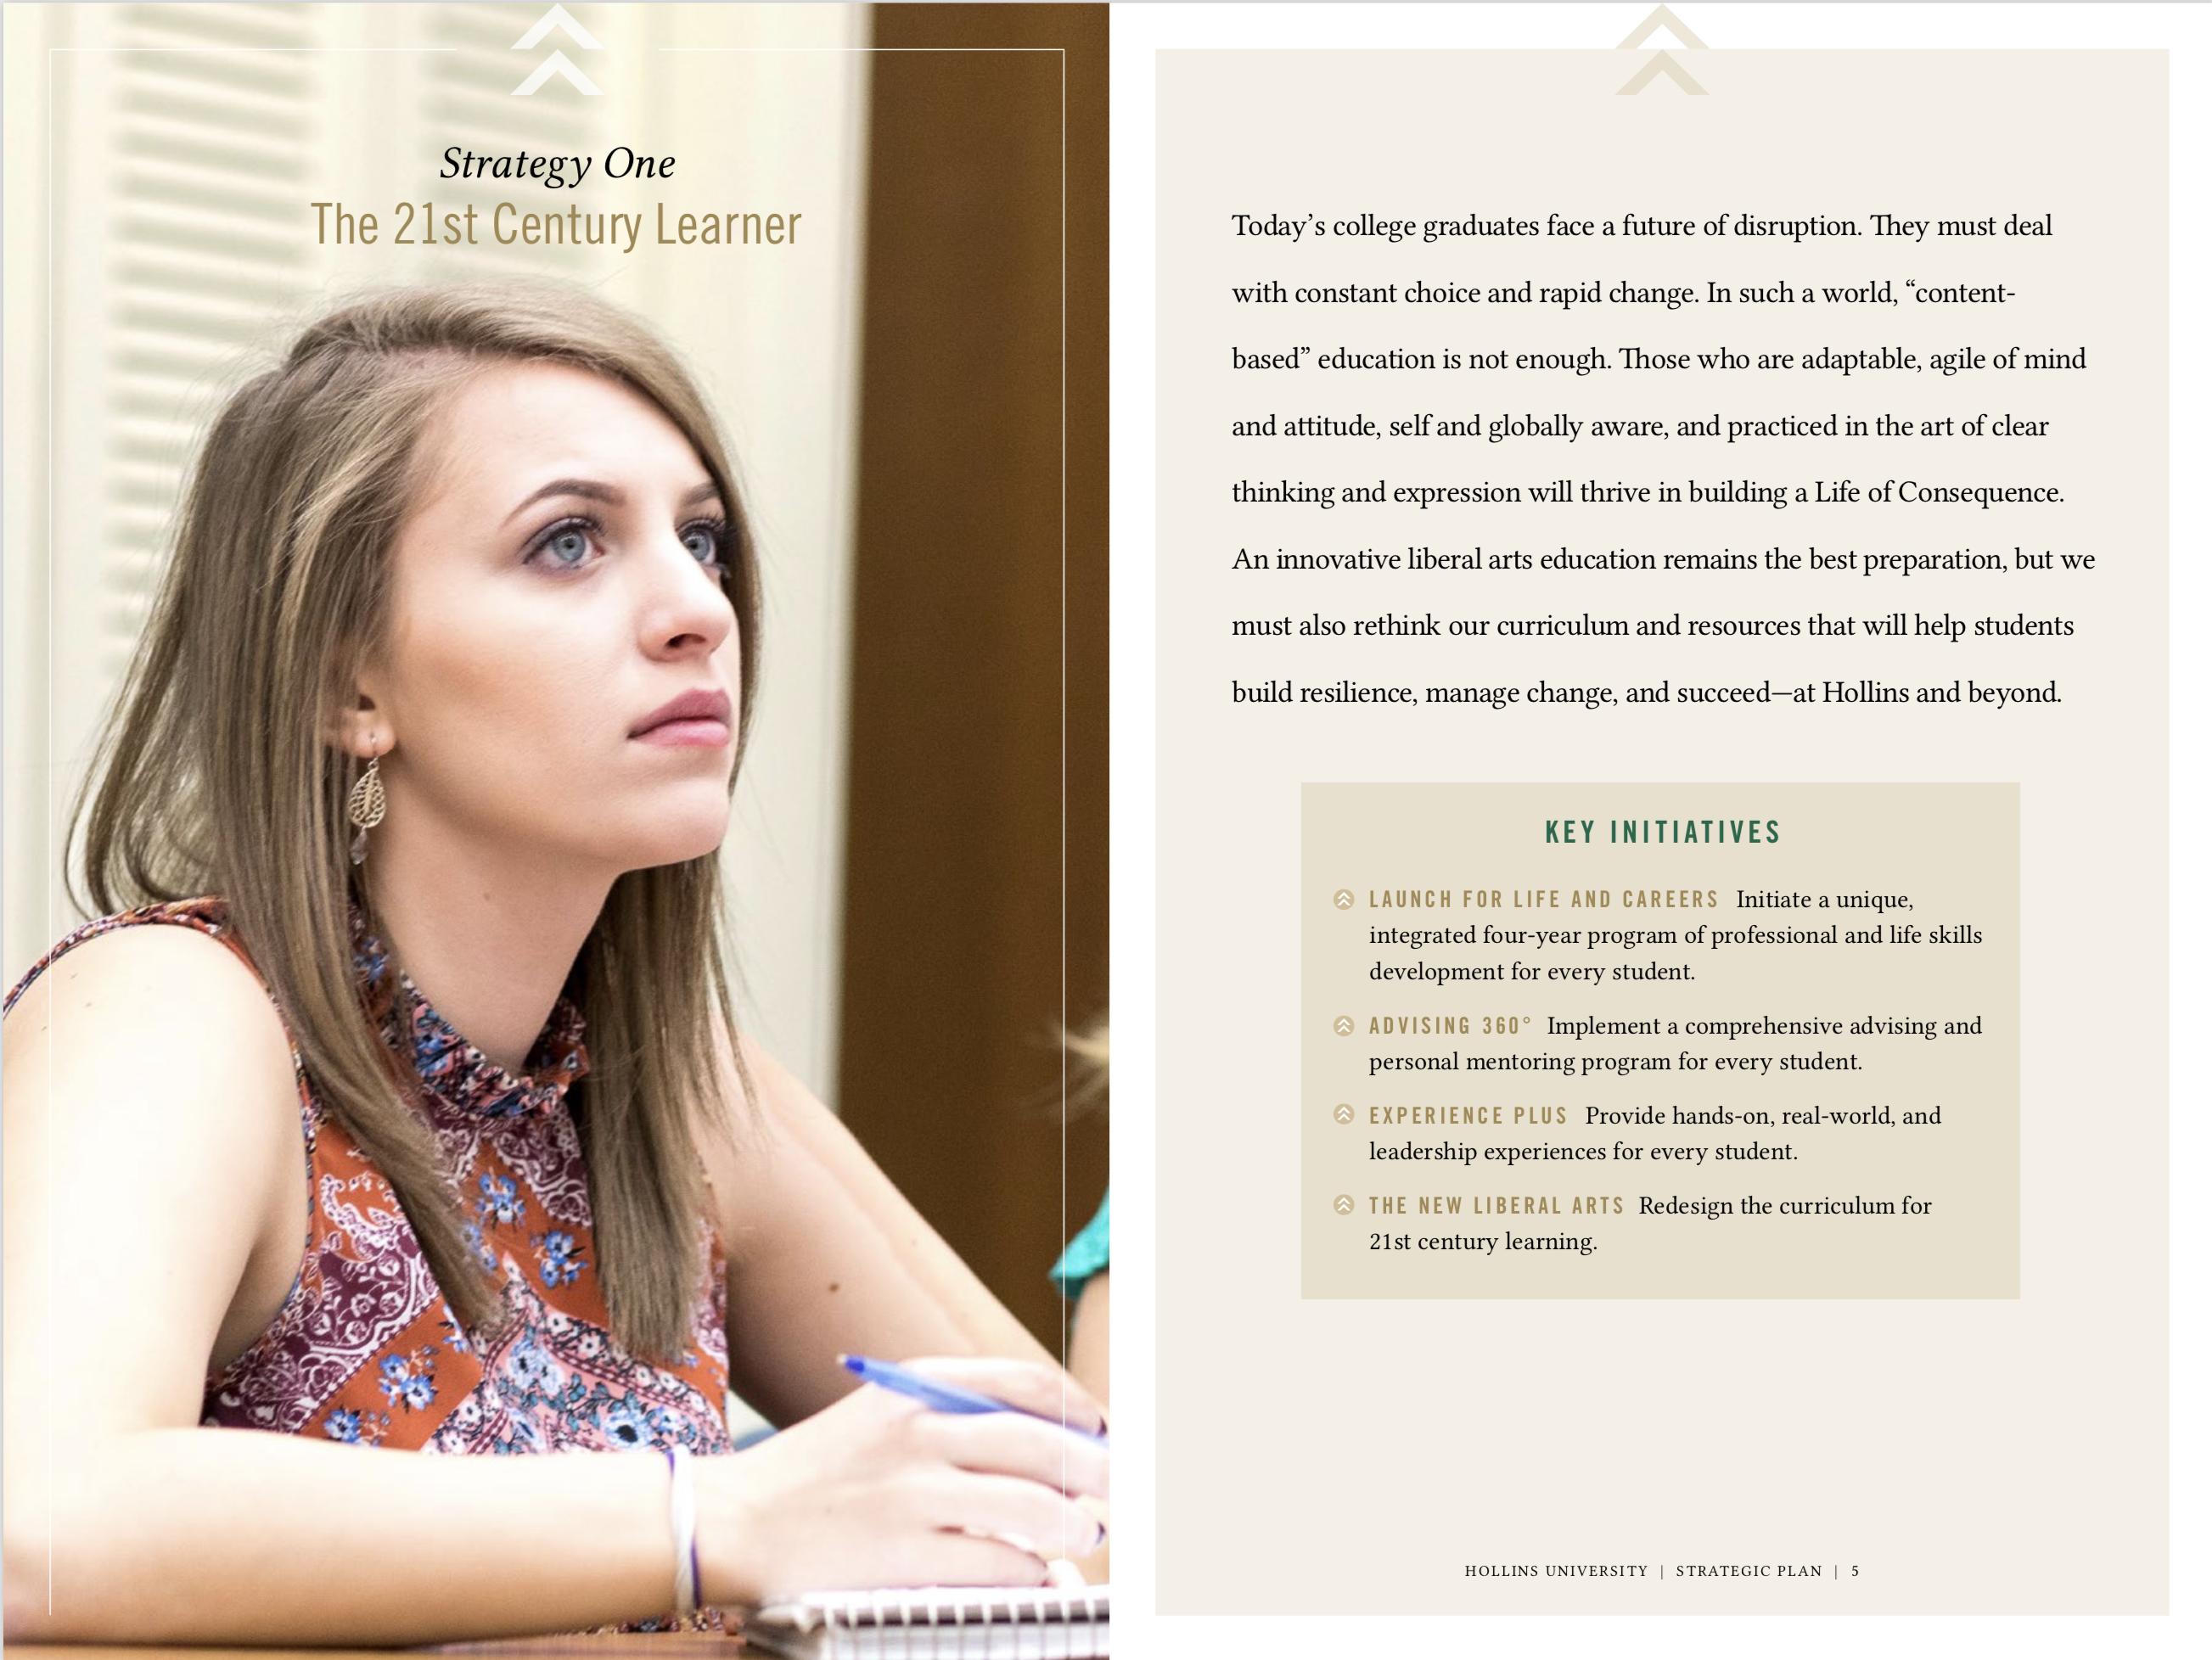 Hollins University strategic vision